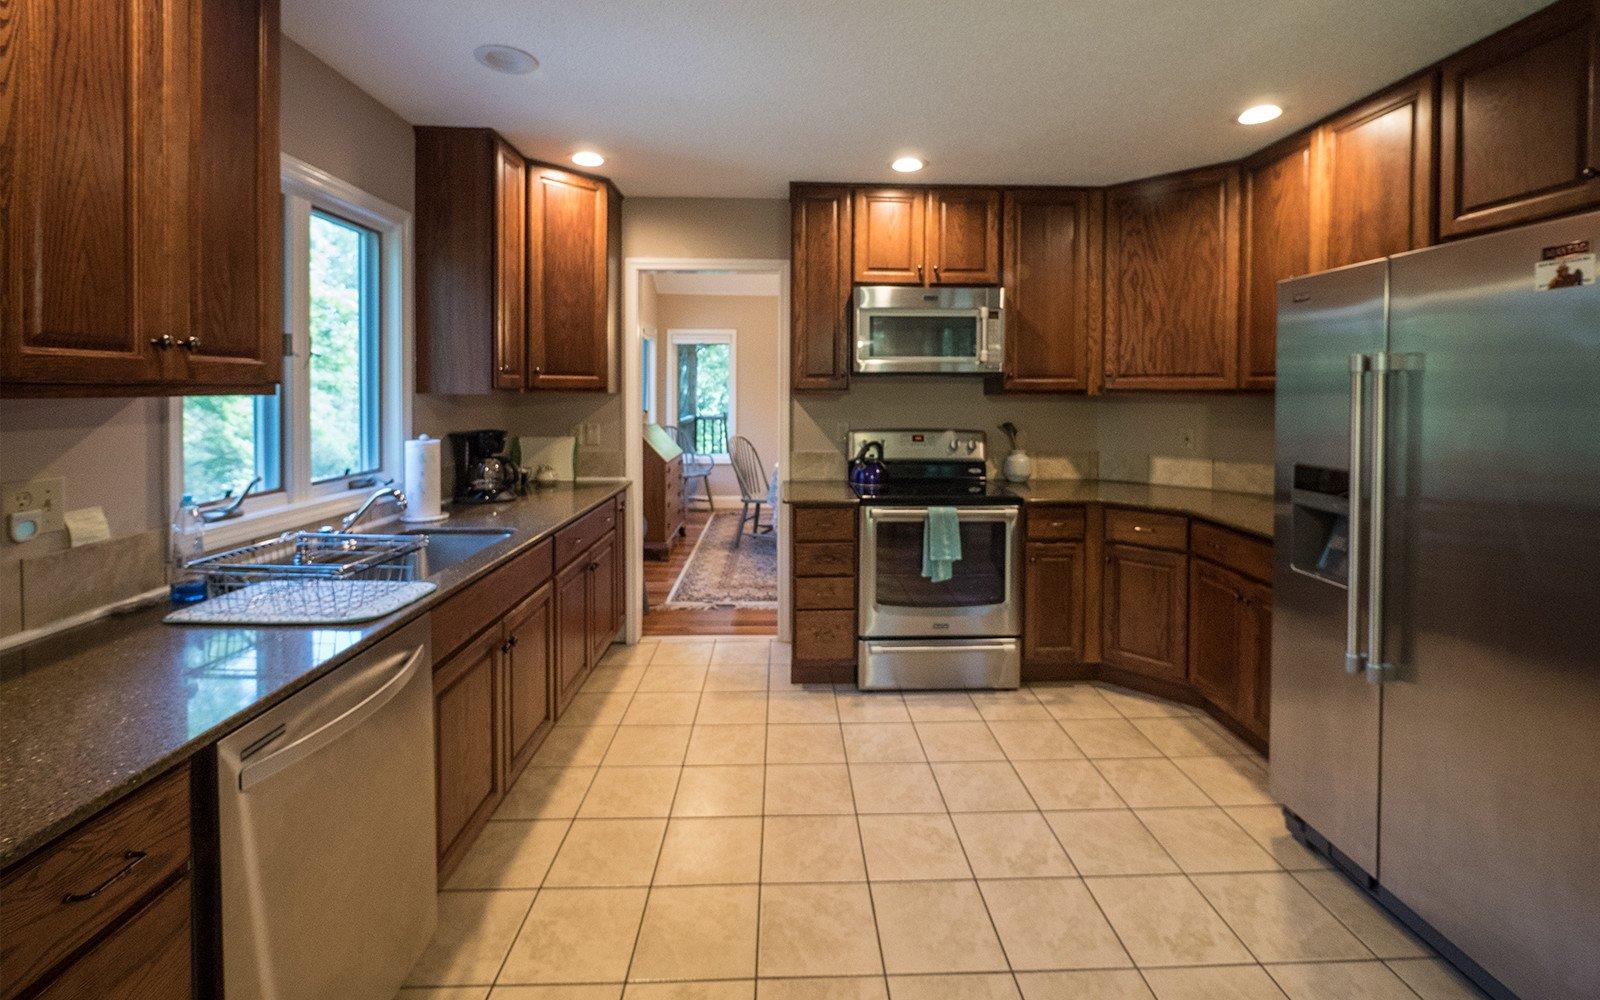 Hilt-Street-house-kitchen